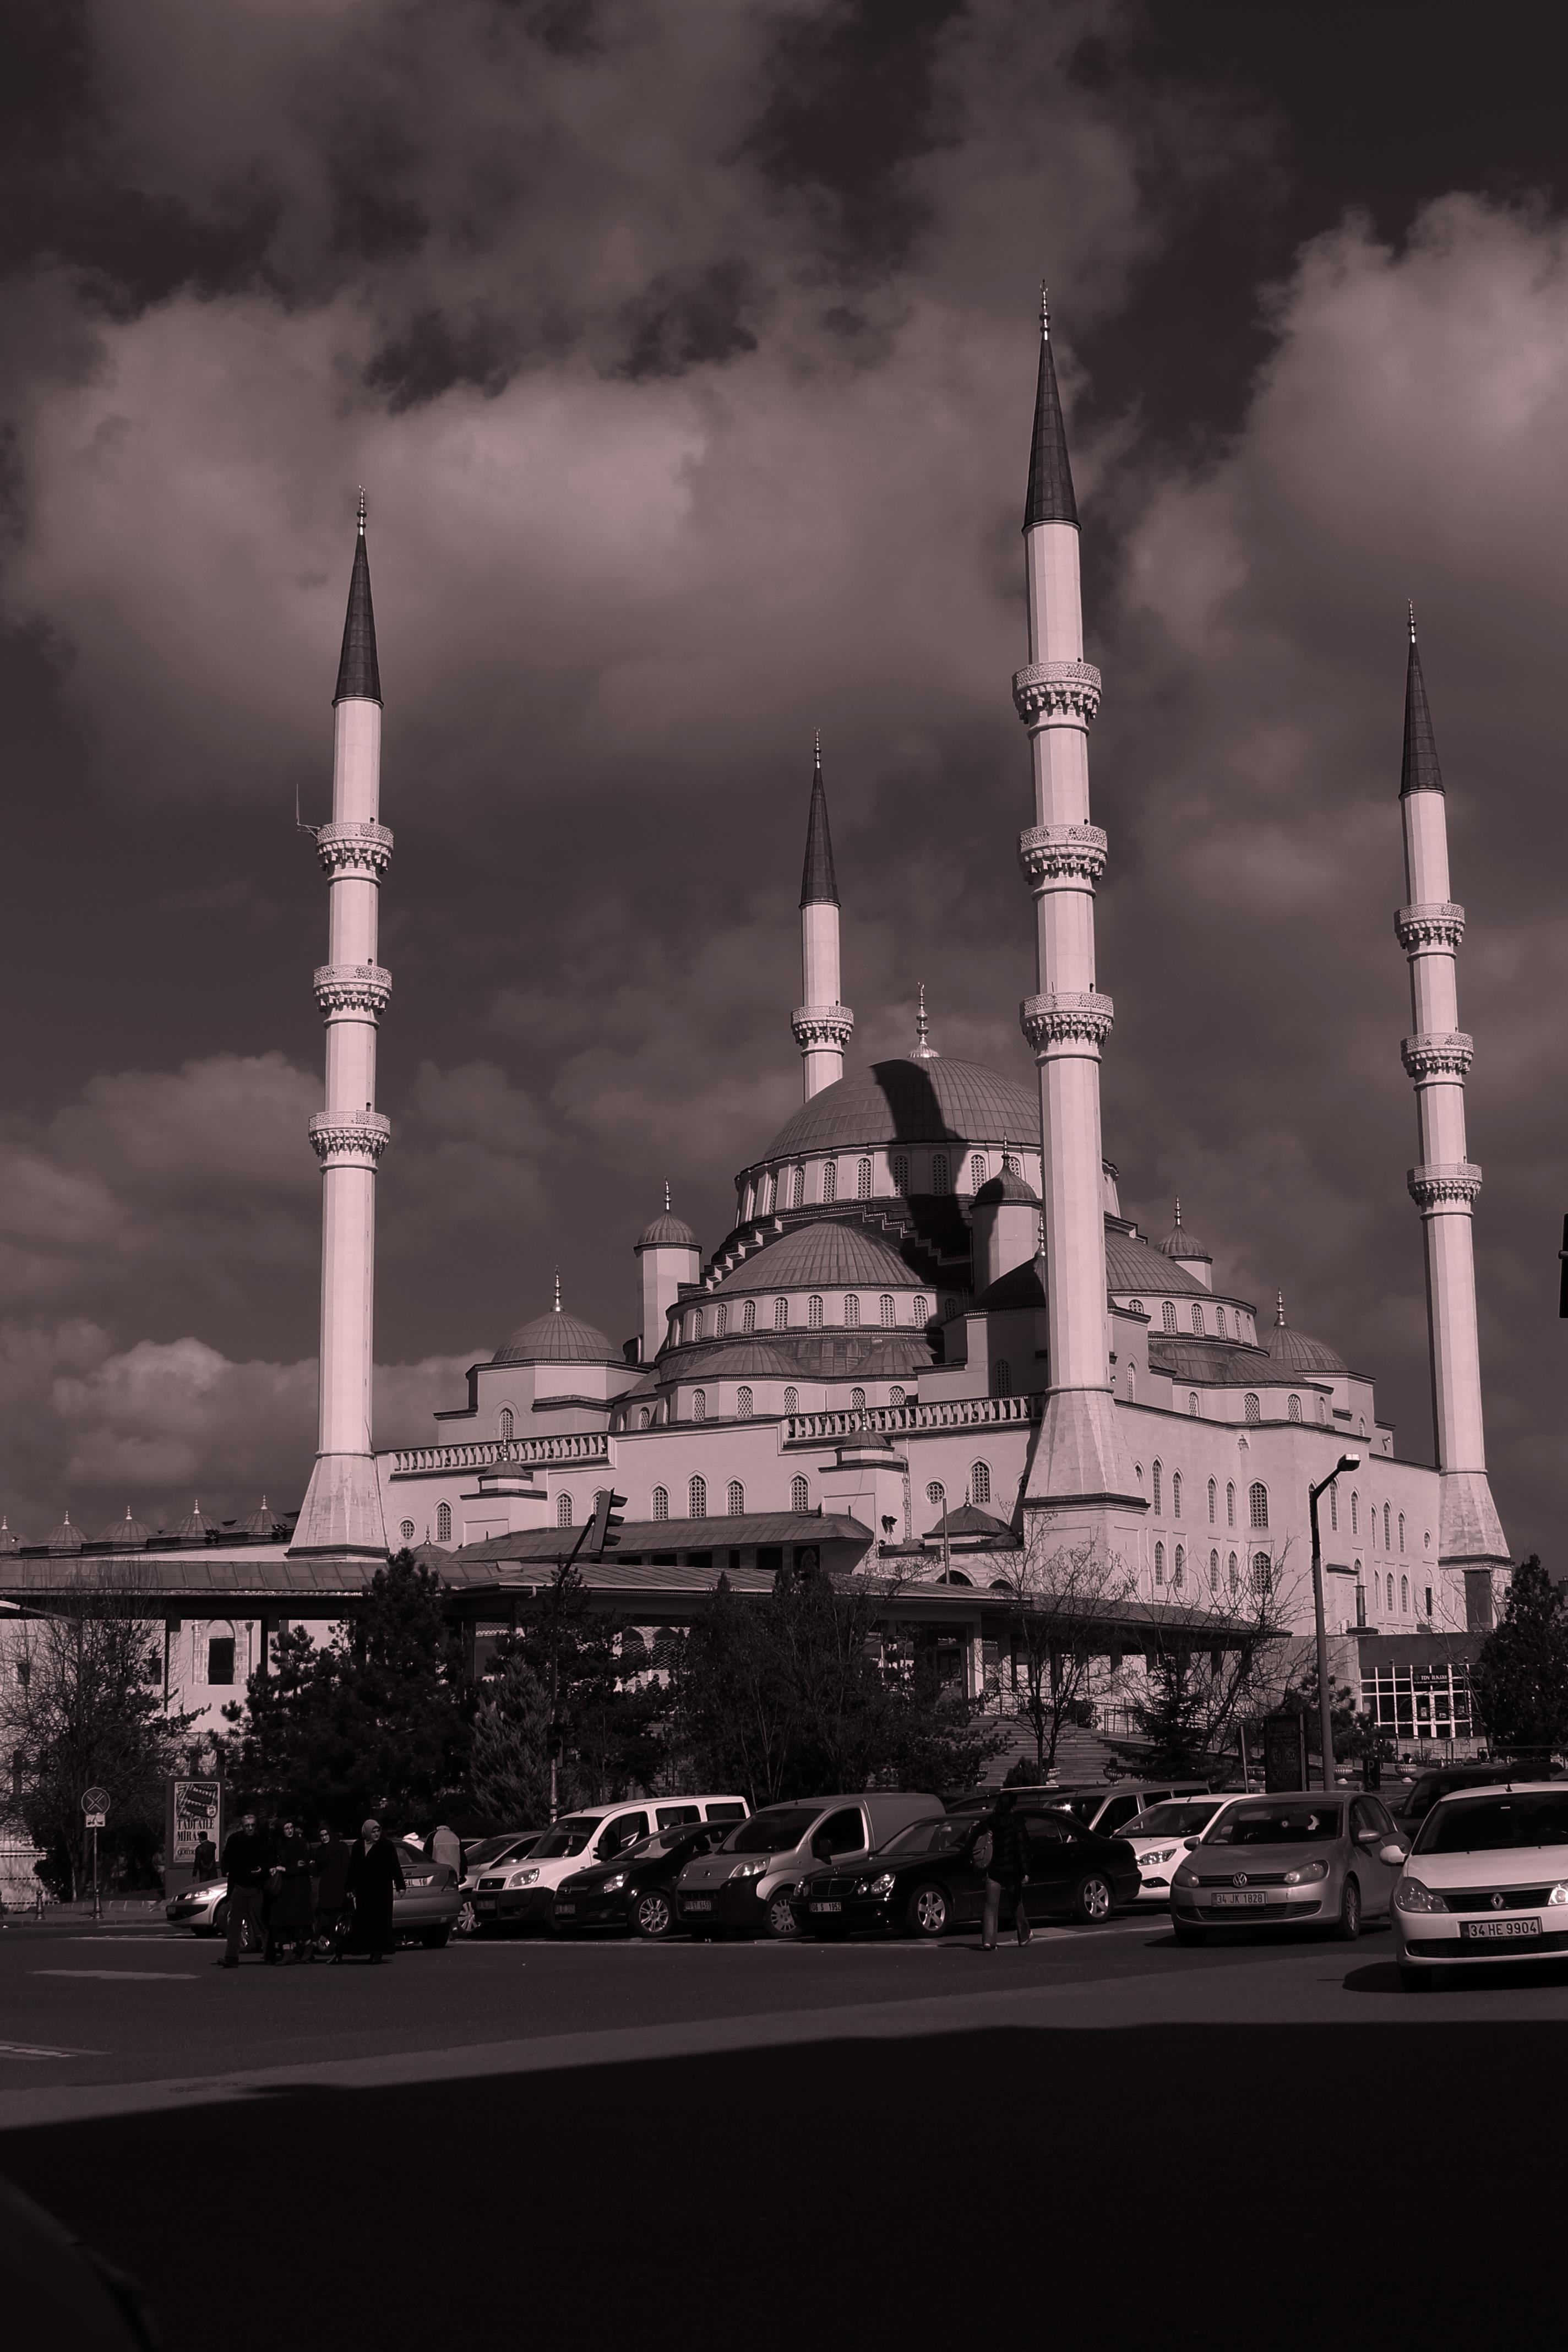 Kocatepe Mosque (Largest Mosque in Ankra, Turkey) - Ankara, Turkey -Picture